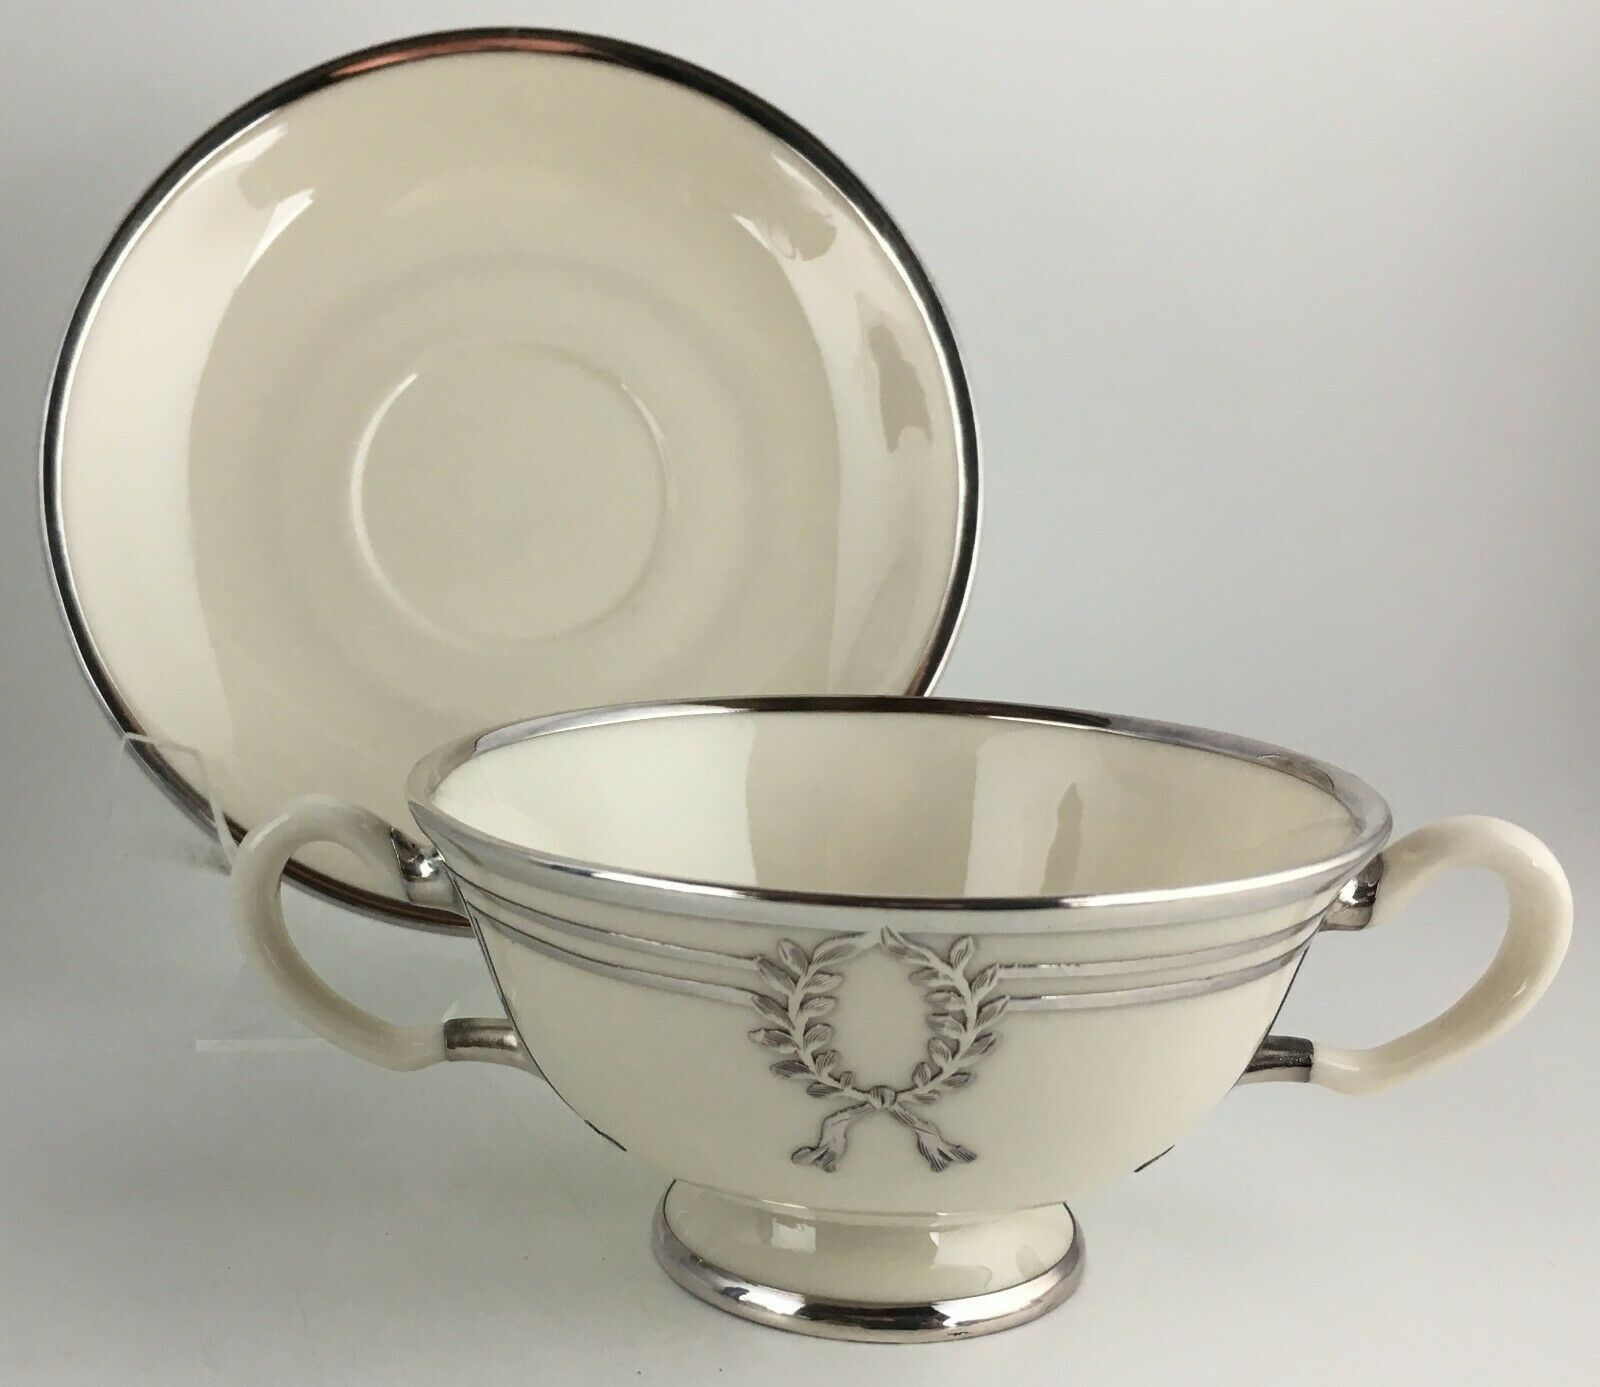 Lenox Belleek L103 Bouillon bowl & saucer / Silver overlay